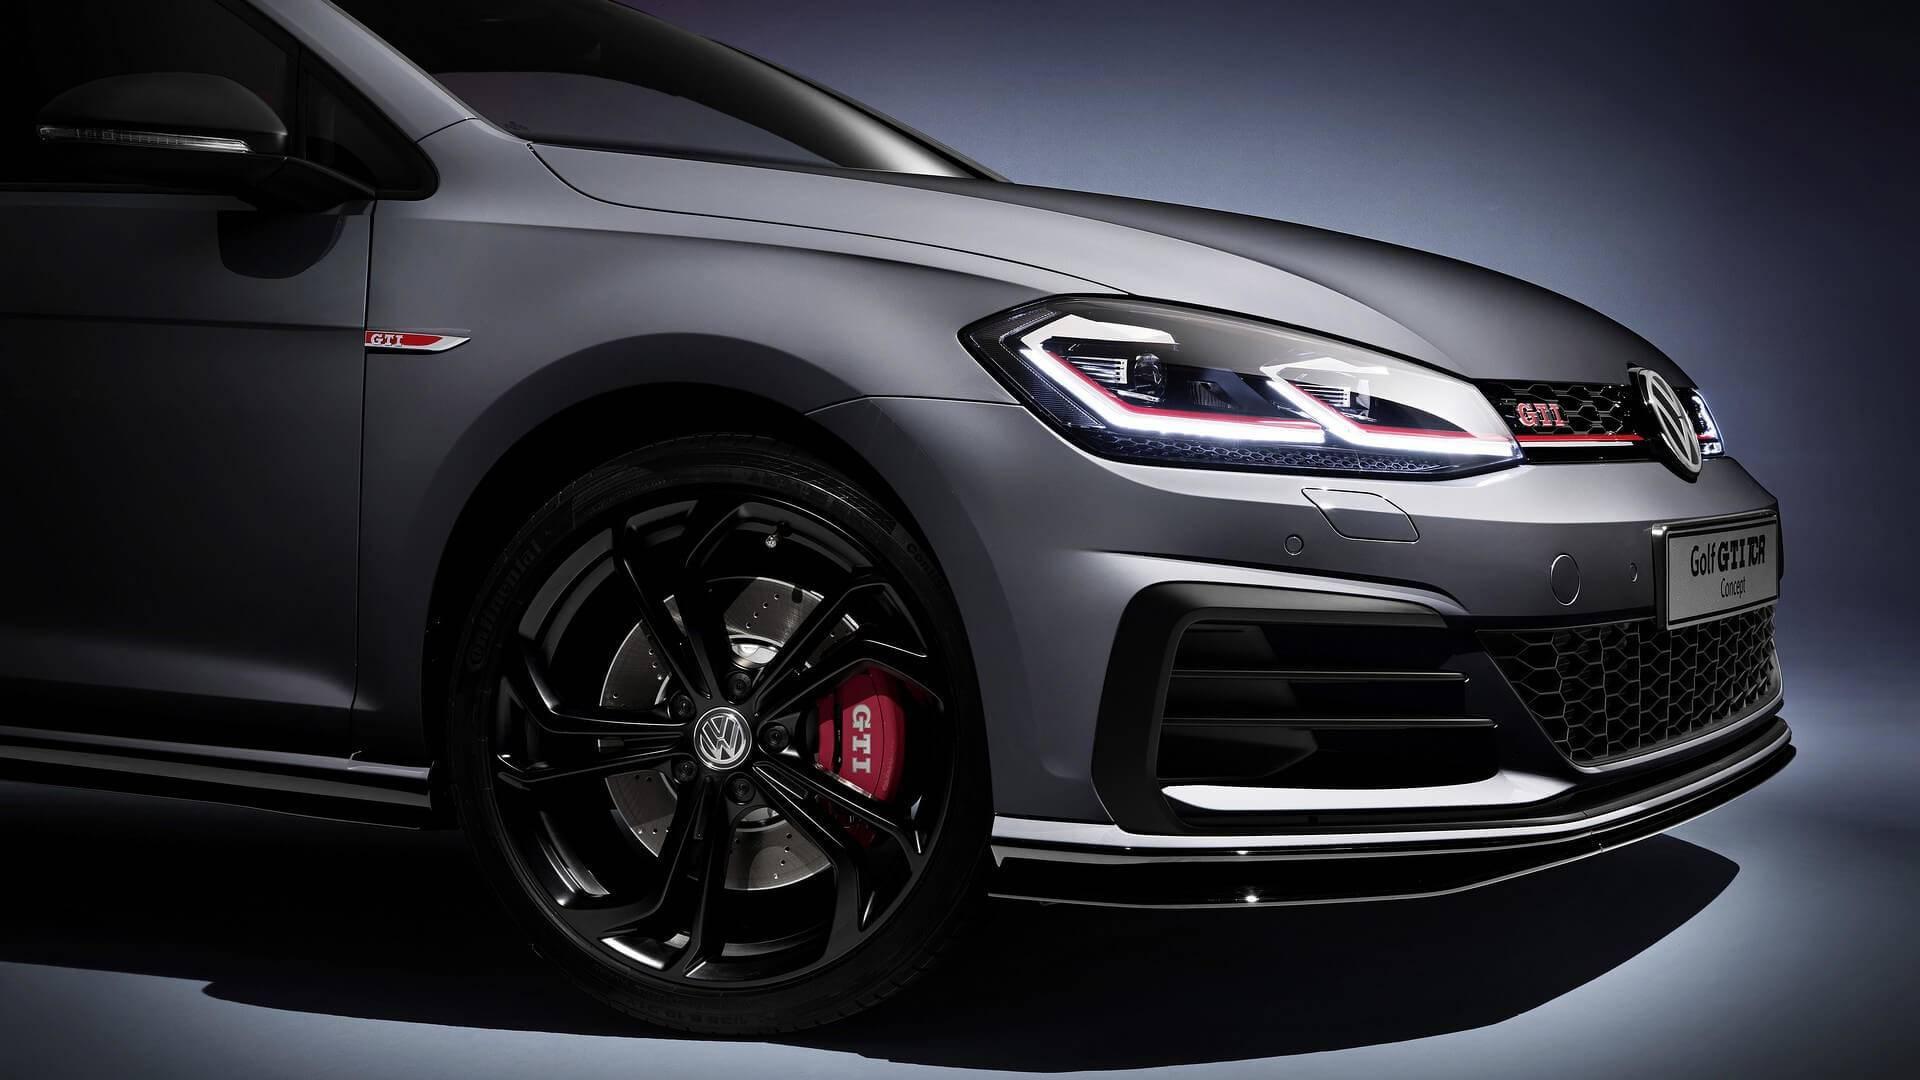 Volkswagen Golf GTI TCR concept